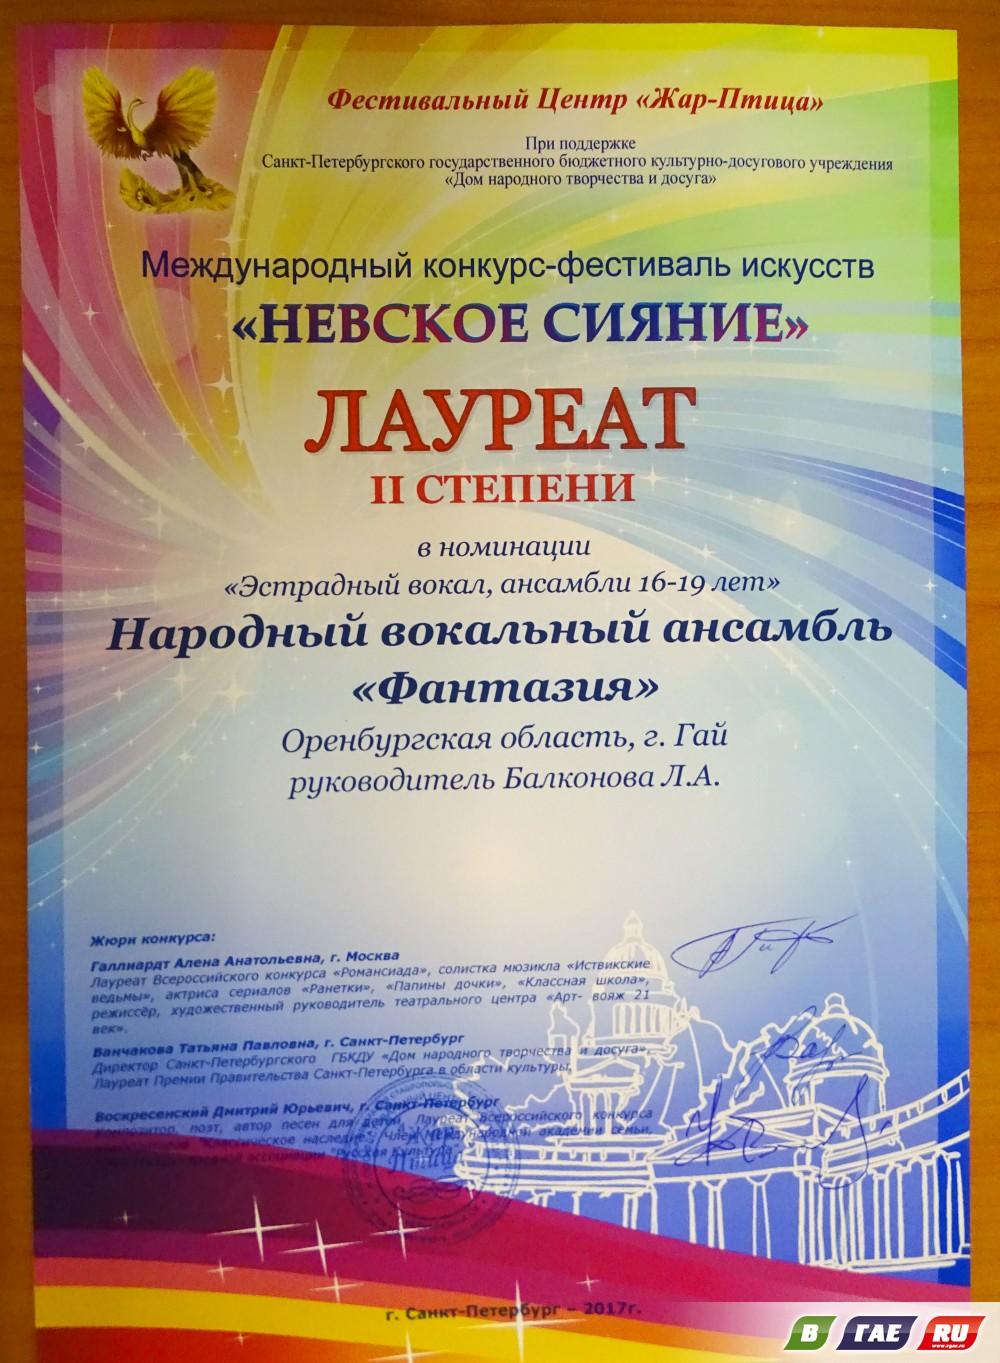 Гайчане покорили Санкт-Петербург